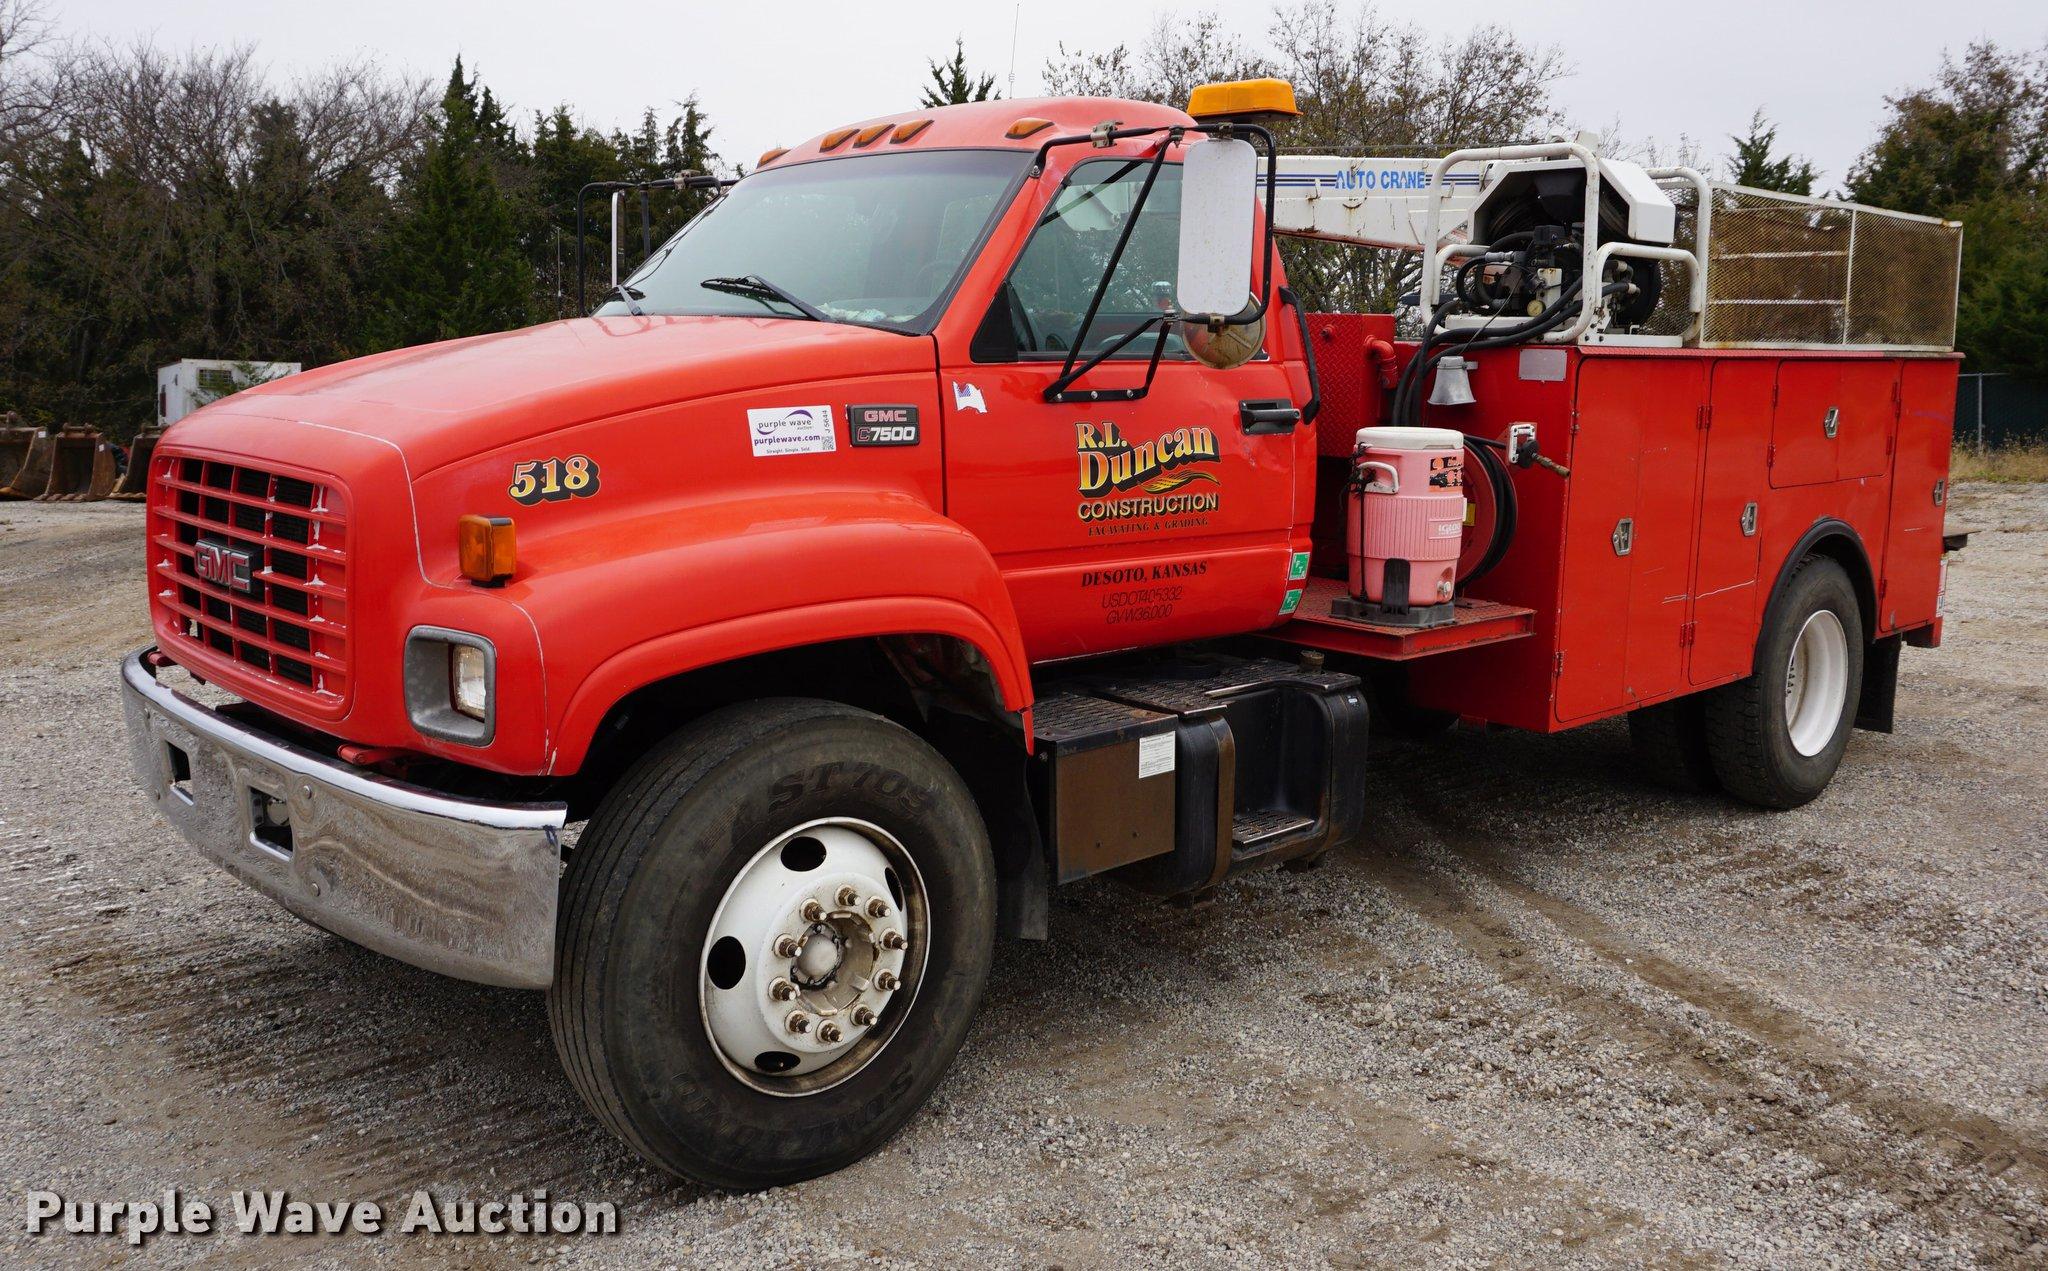 1998 gmc c7500 service truck item j5644 sold november 3 rh purplewave com 2005 GMC C7500 Owner's Manual GMC C7500 Steering Gearbox